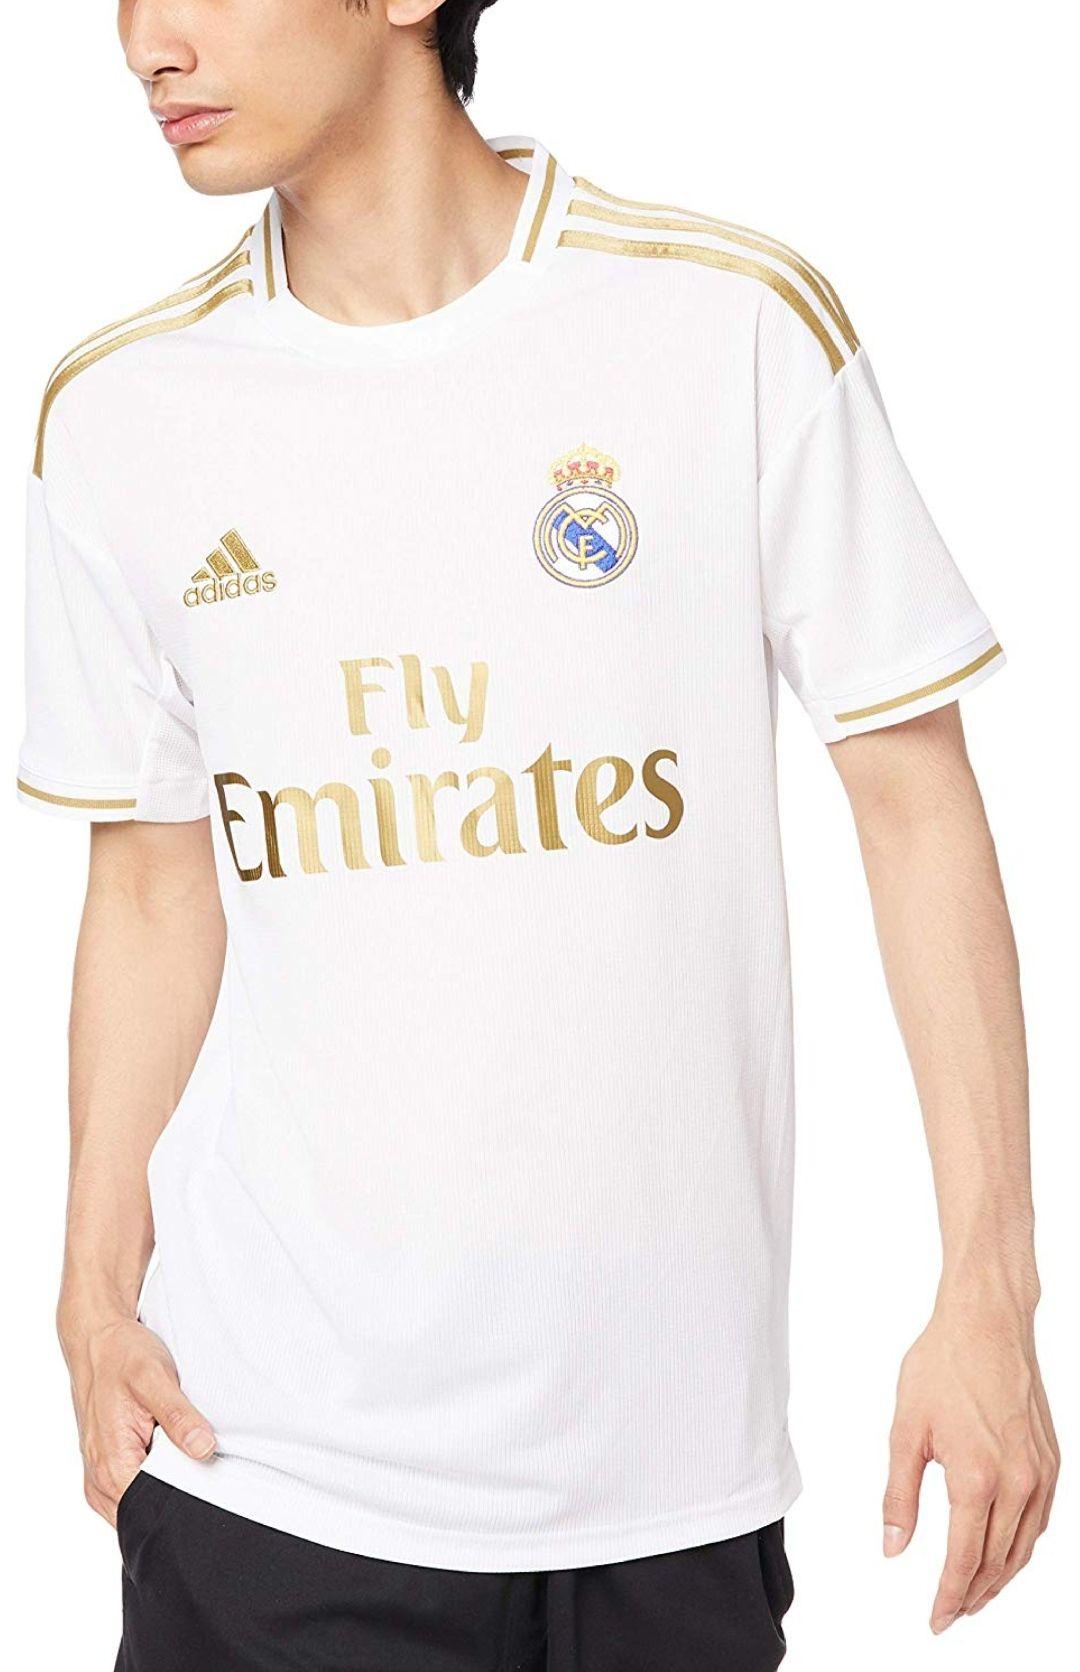 Camiseta Real Madrid oficial talla XS